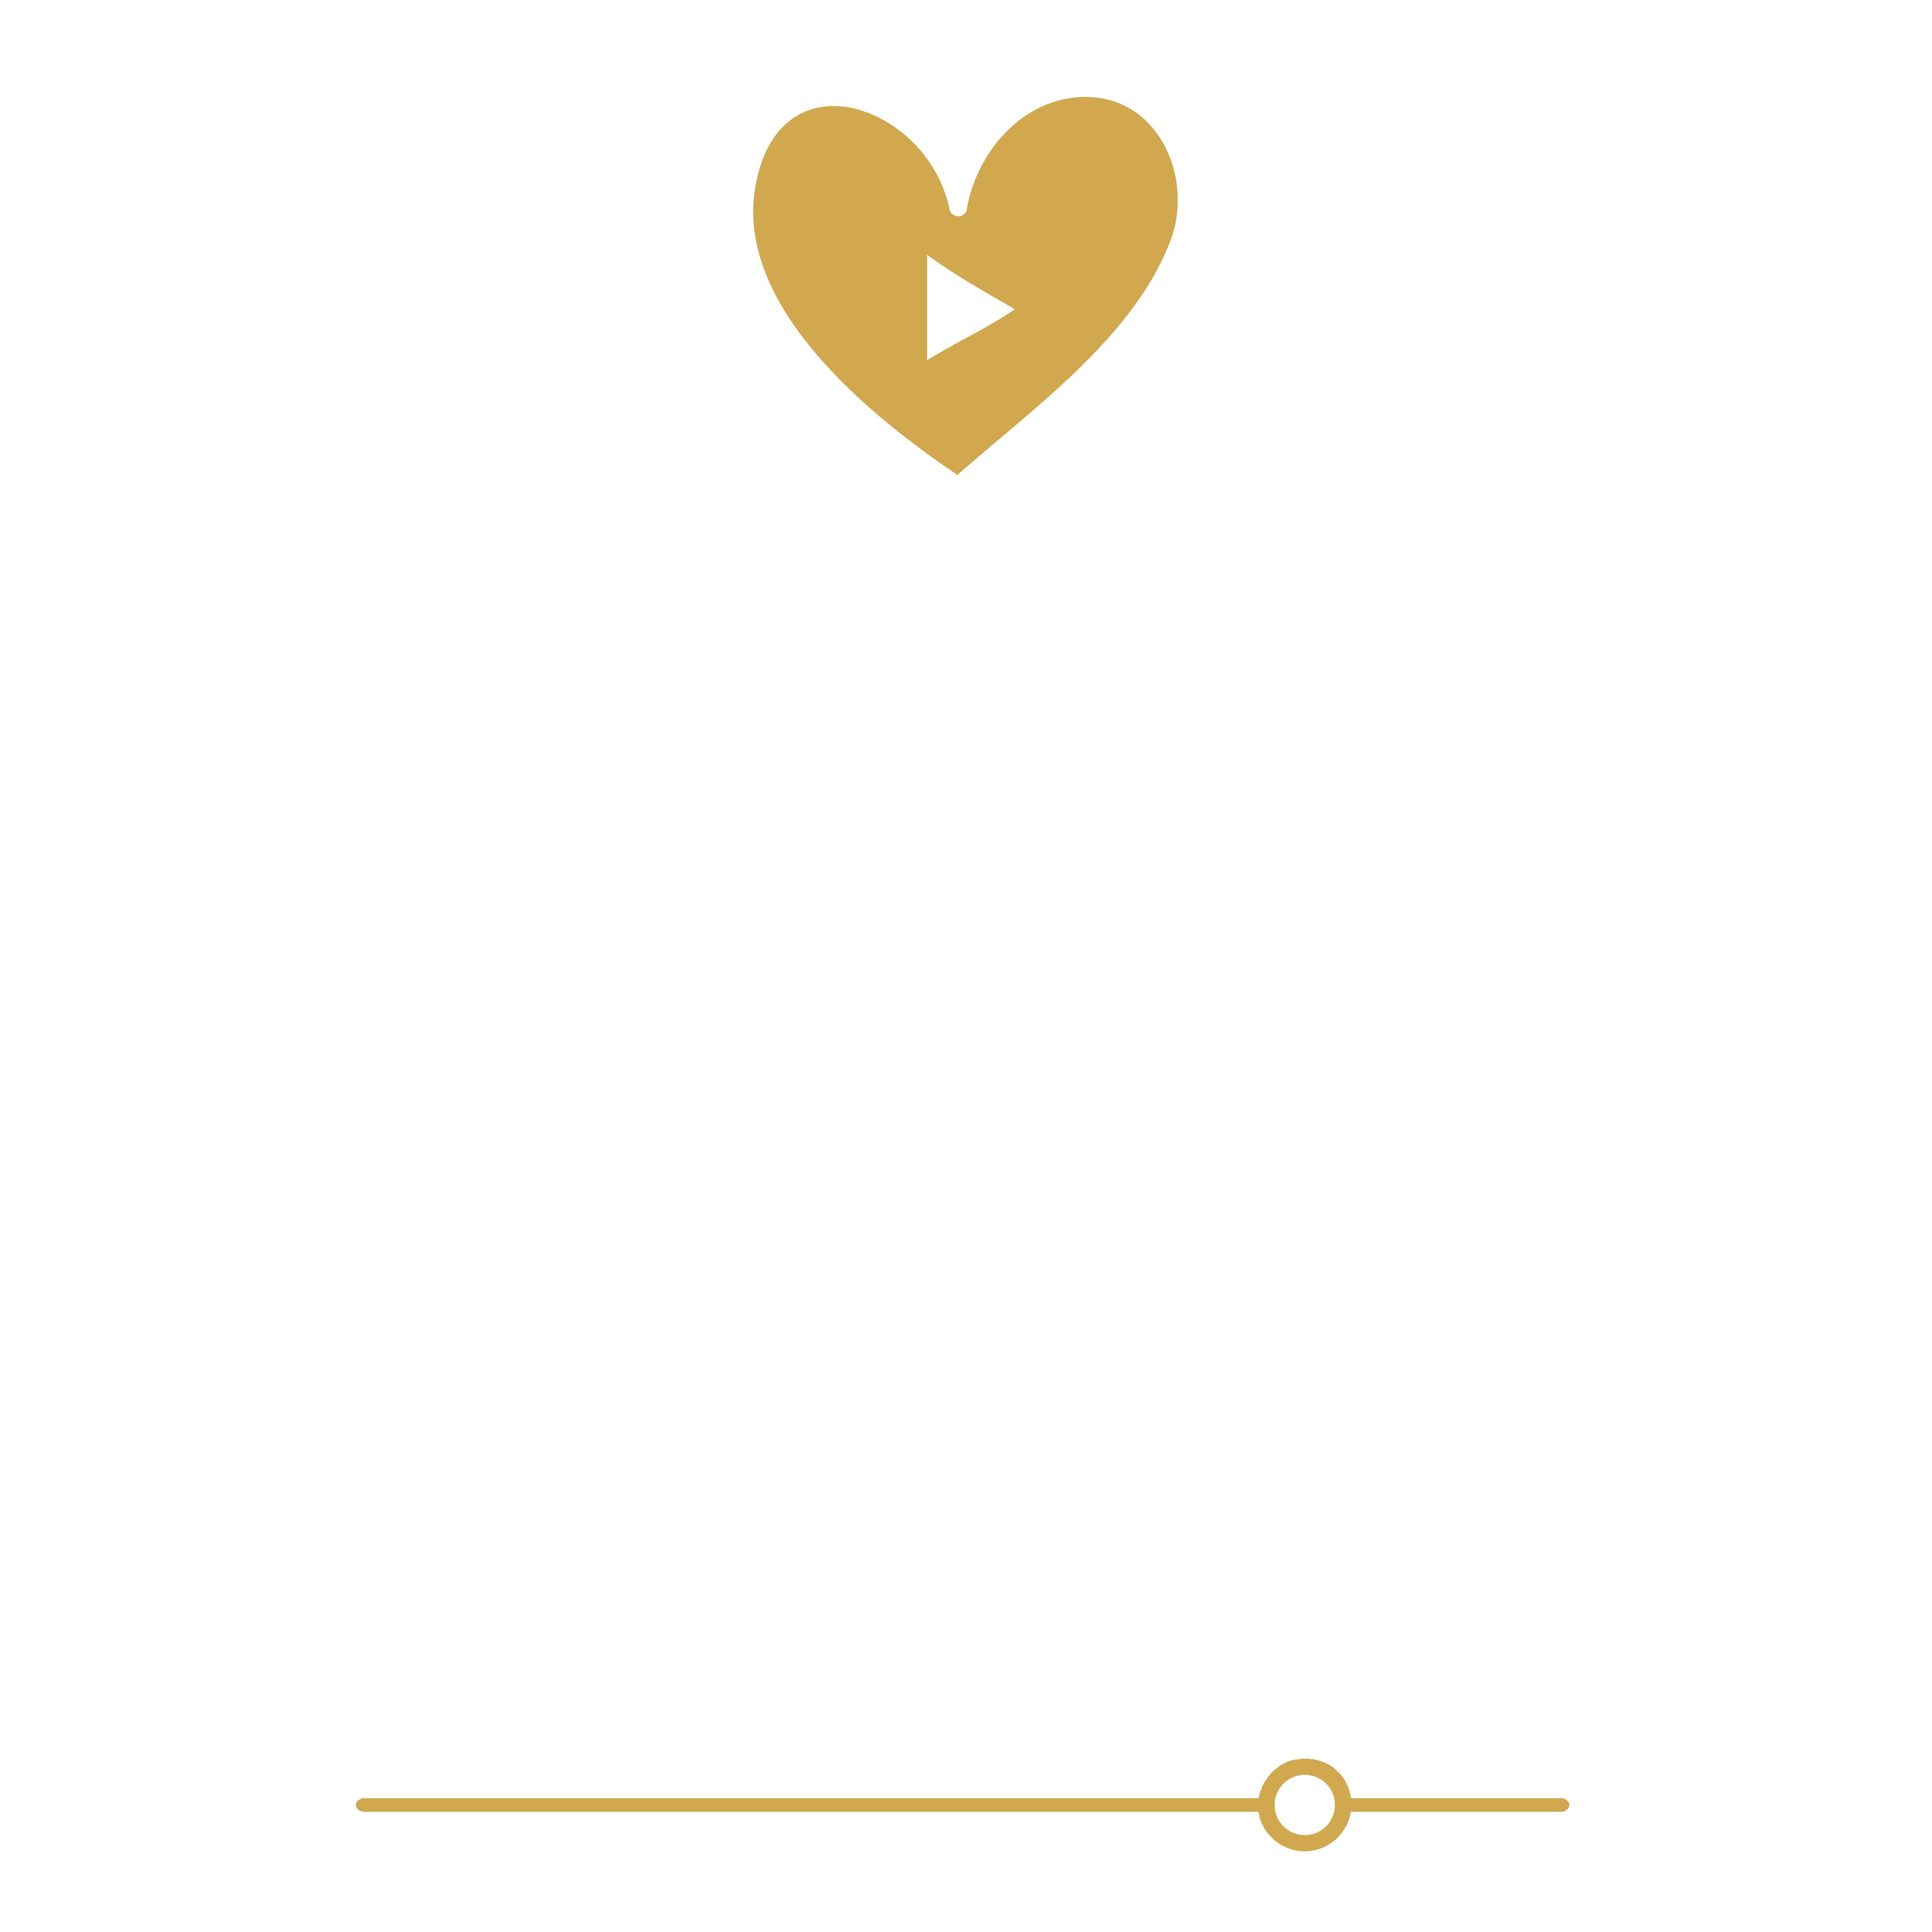 Vlog Visuals